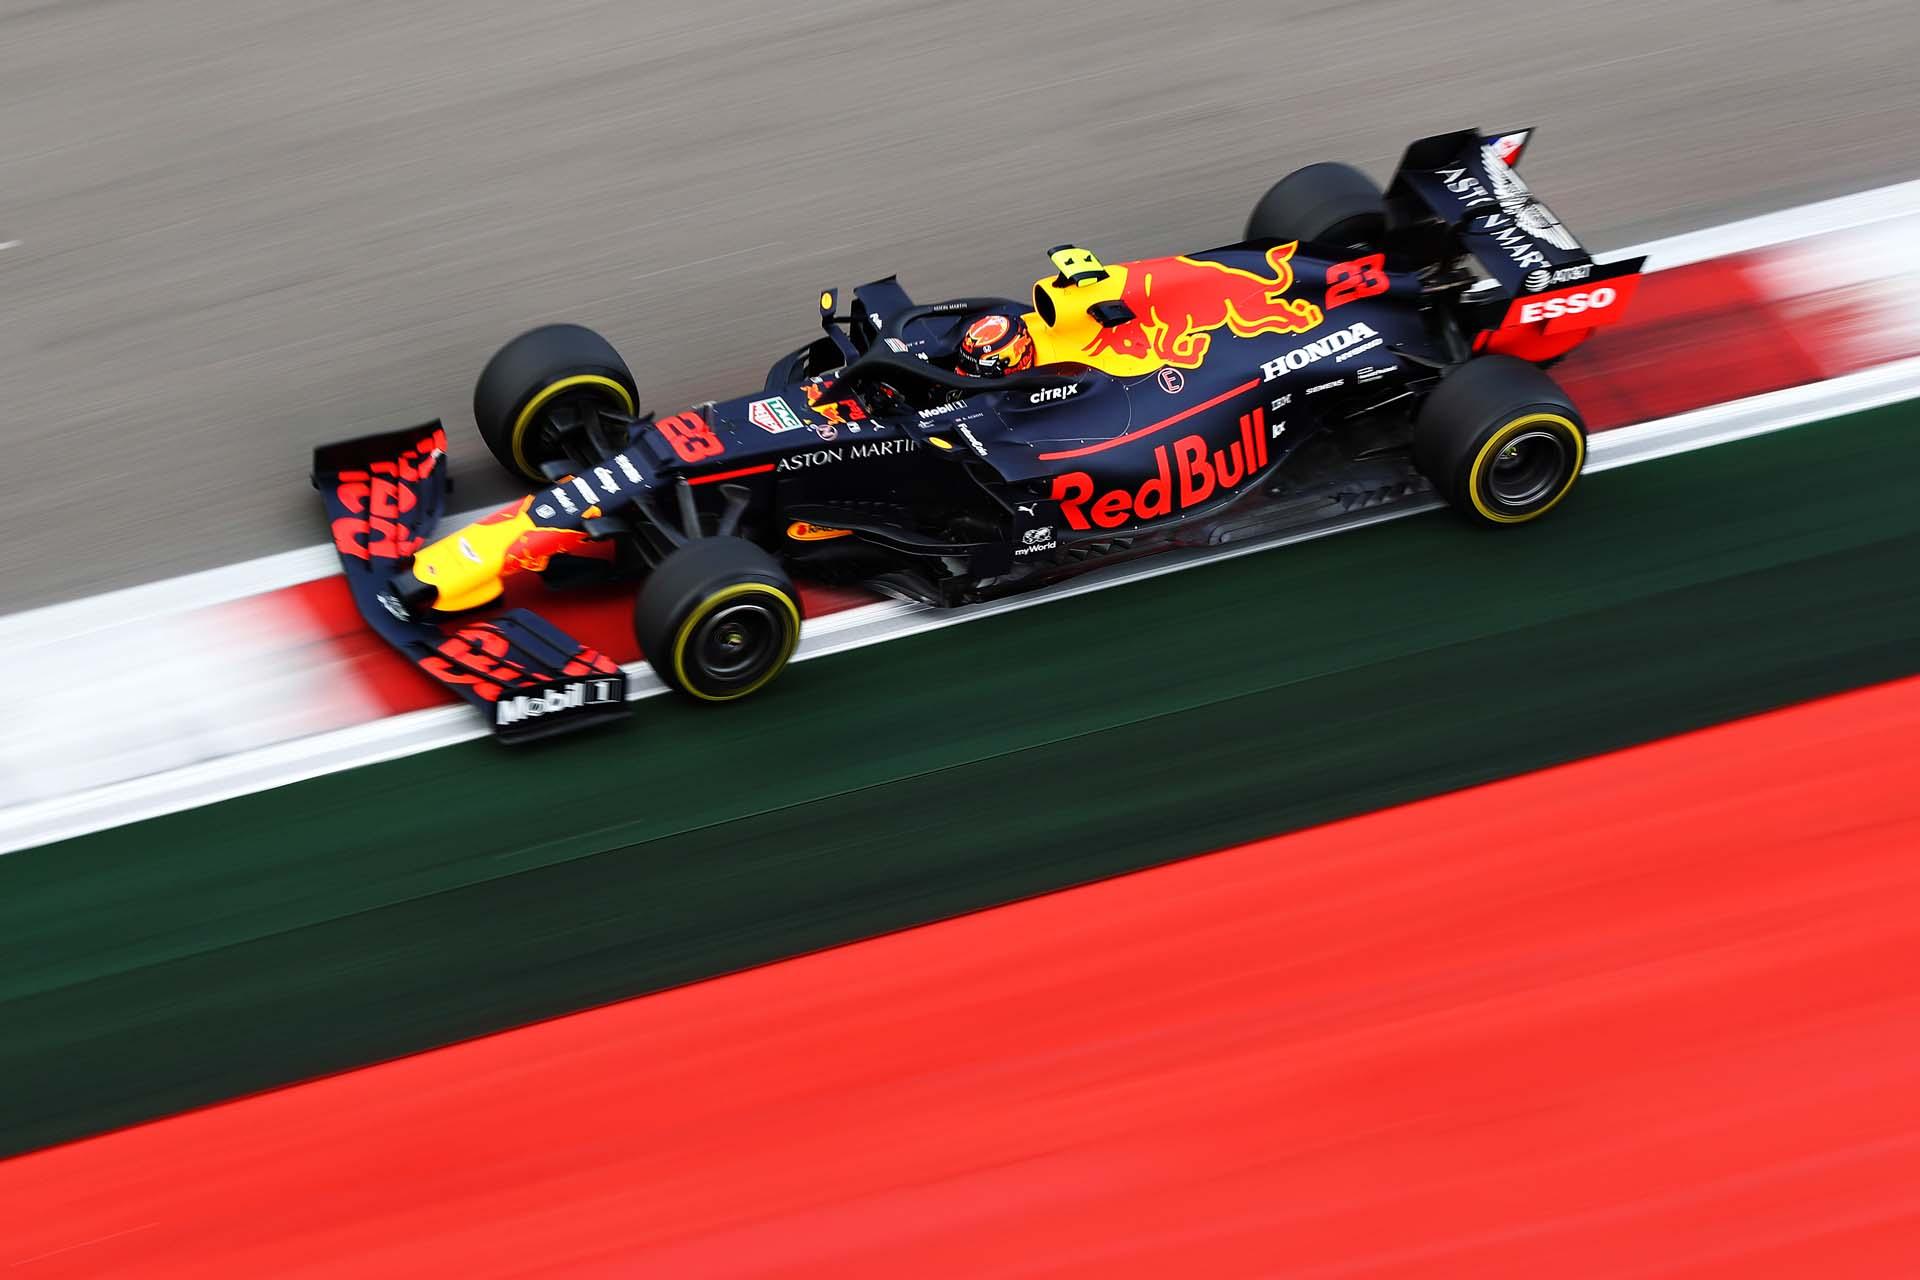 F1 Grand Prix of Russia - Final Practice